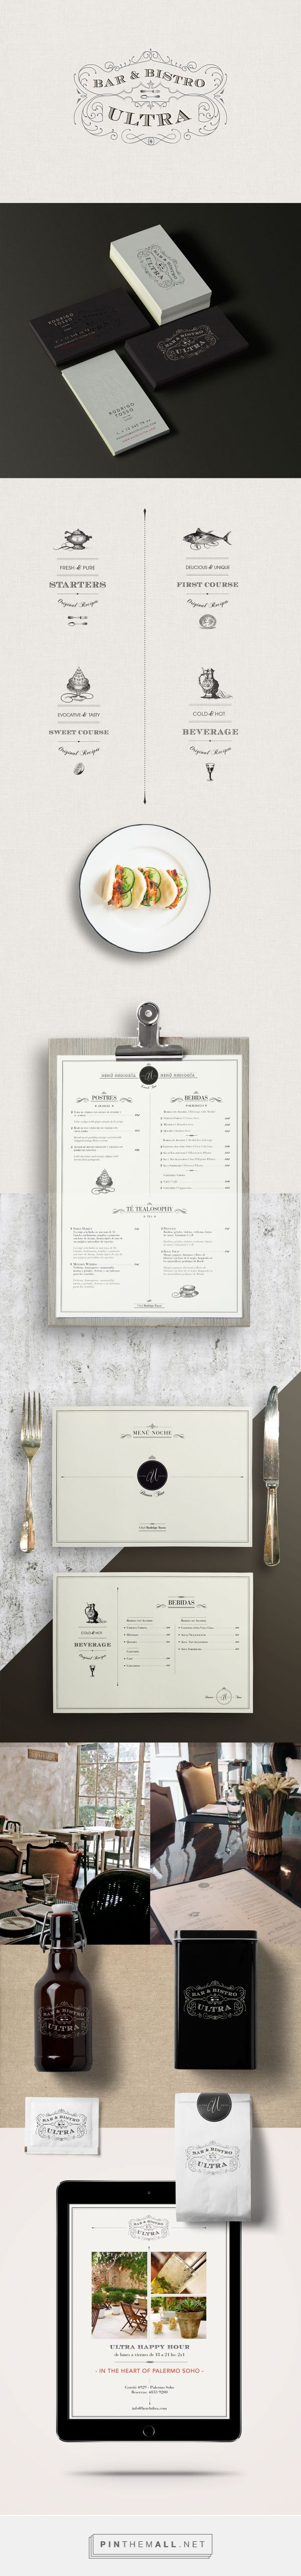 Ultra Bistro Restaurant Branding and Menu Design by Bunker3022 | Fivestar Branding Agency – Design and Branding Agency & Inspiration Gallery